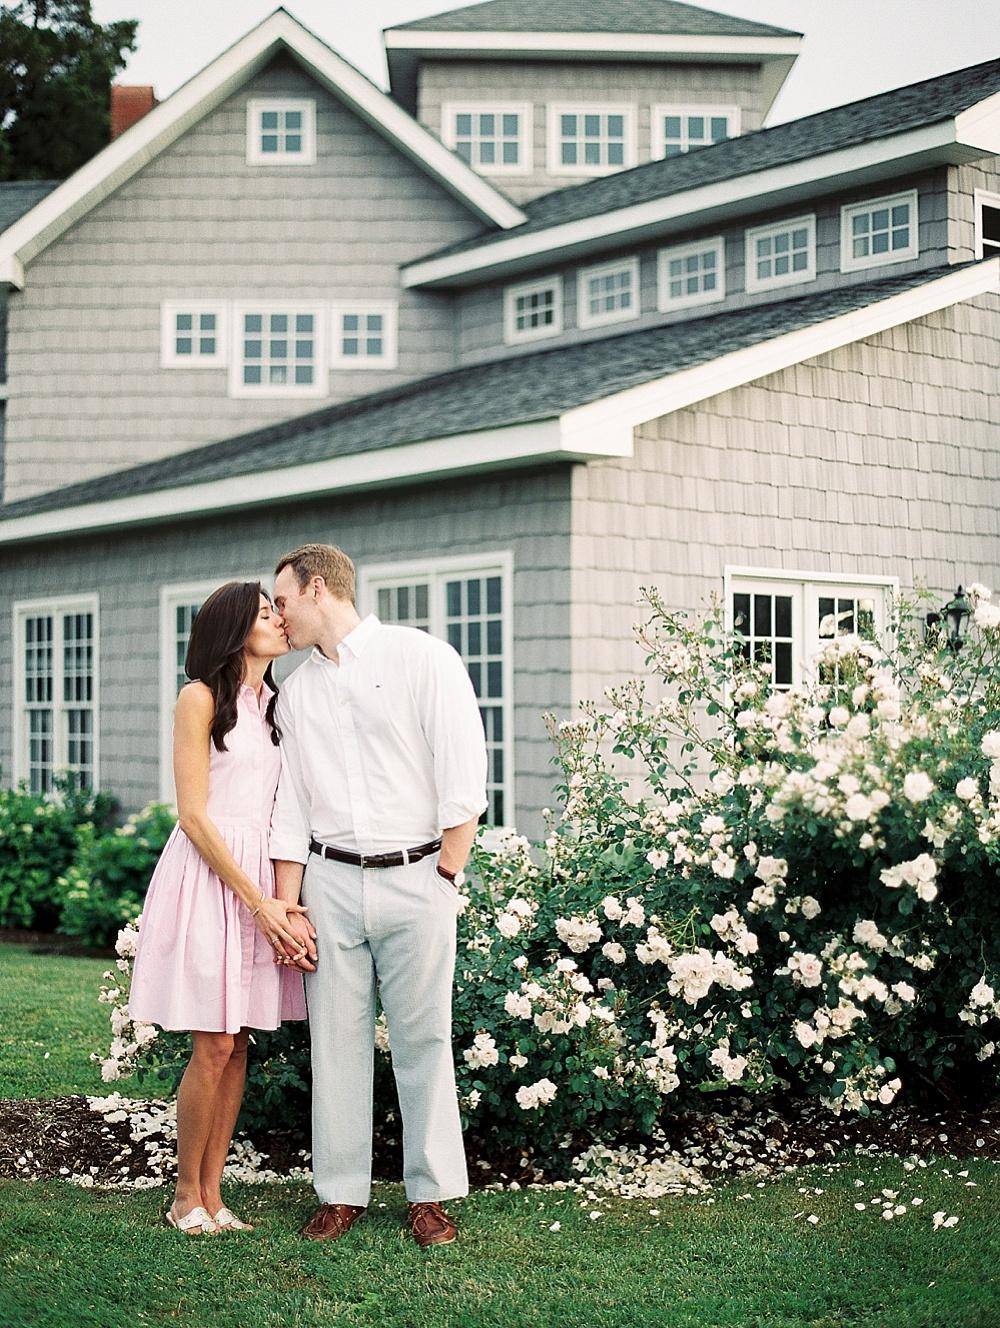 annapolis-maryland-engagement-wedding-photographer-portrait-film-photo0161.jpg